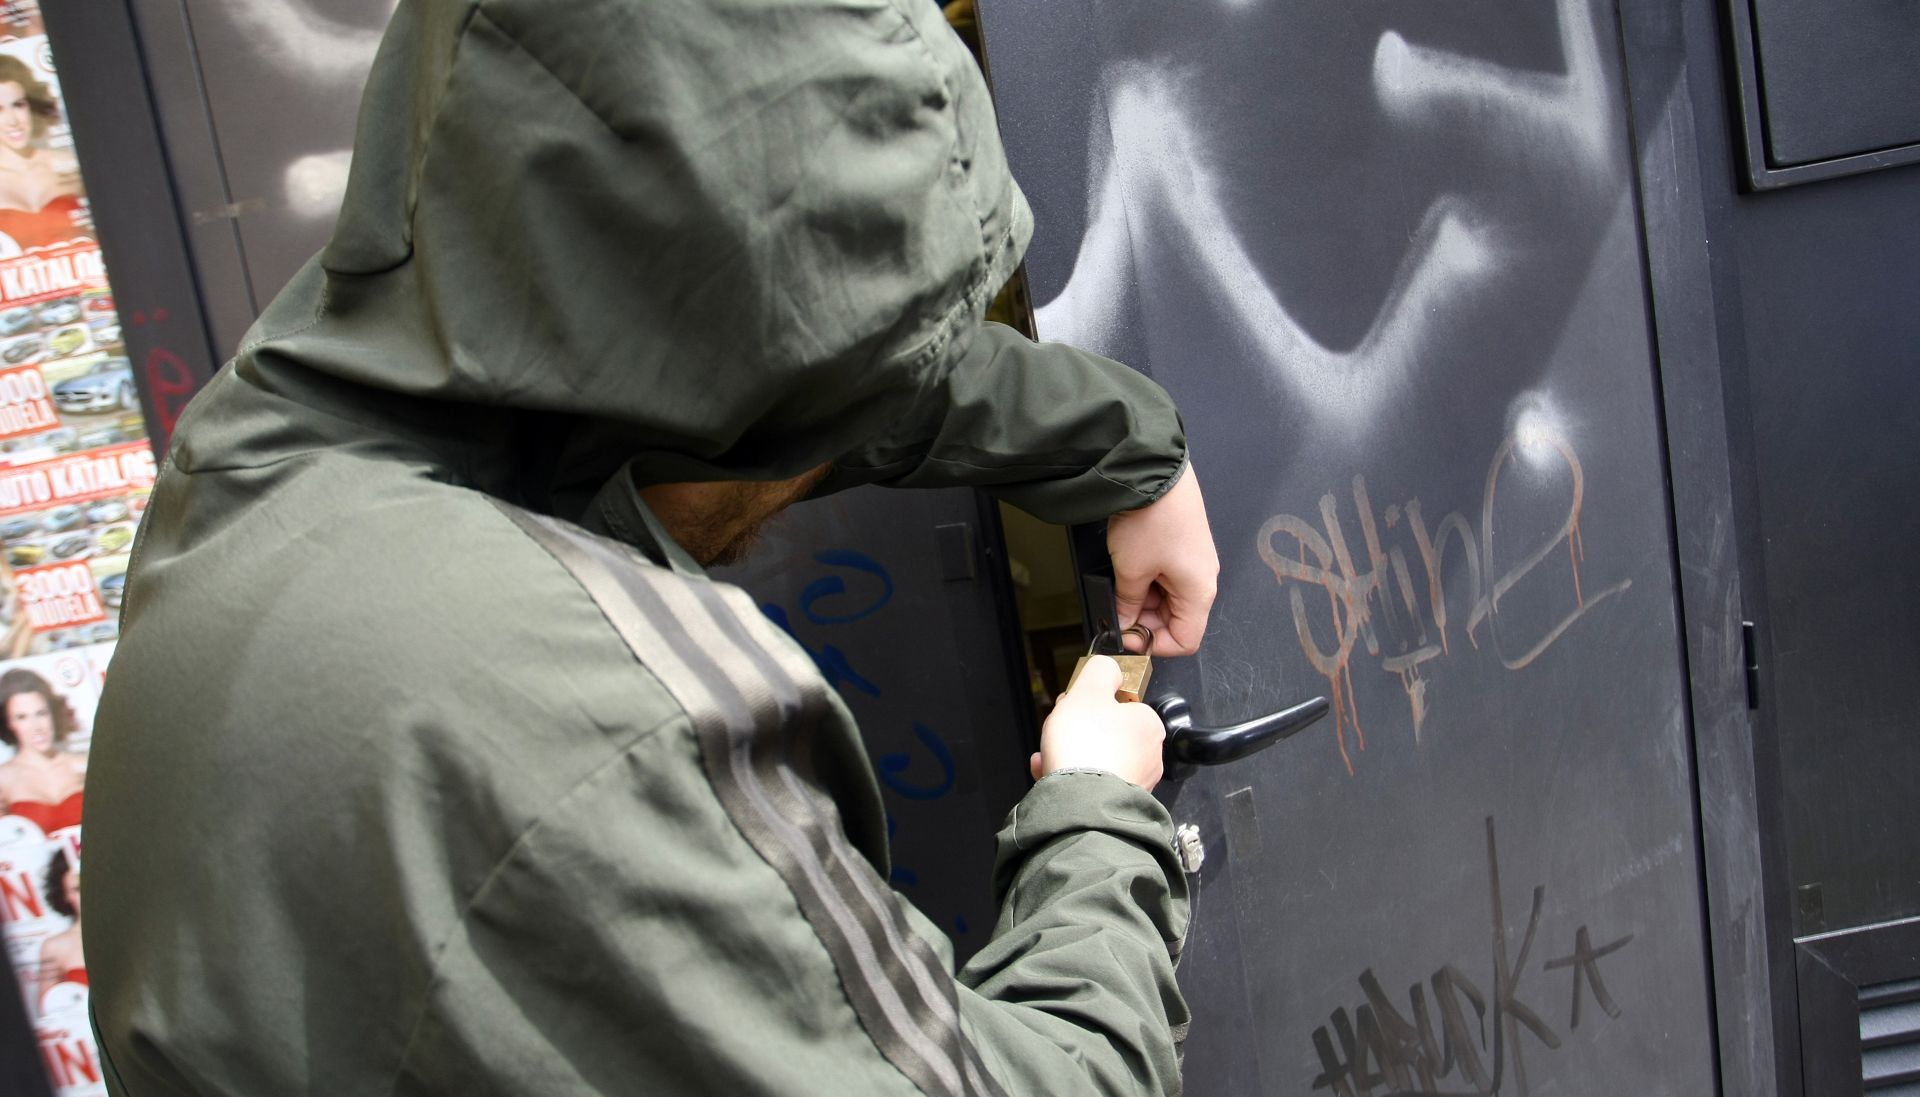 ZAGREB Uhićen dvojac osumnjičen za čak 14 provala u veljači